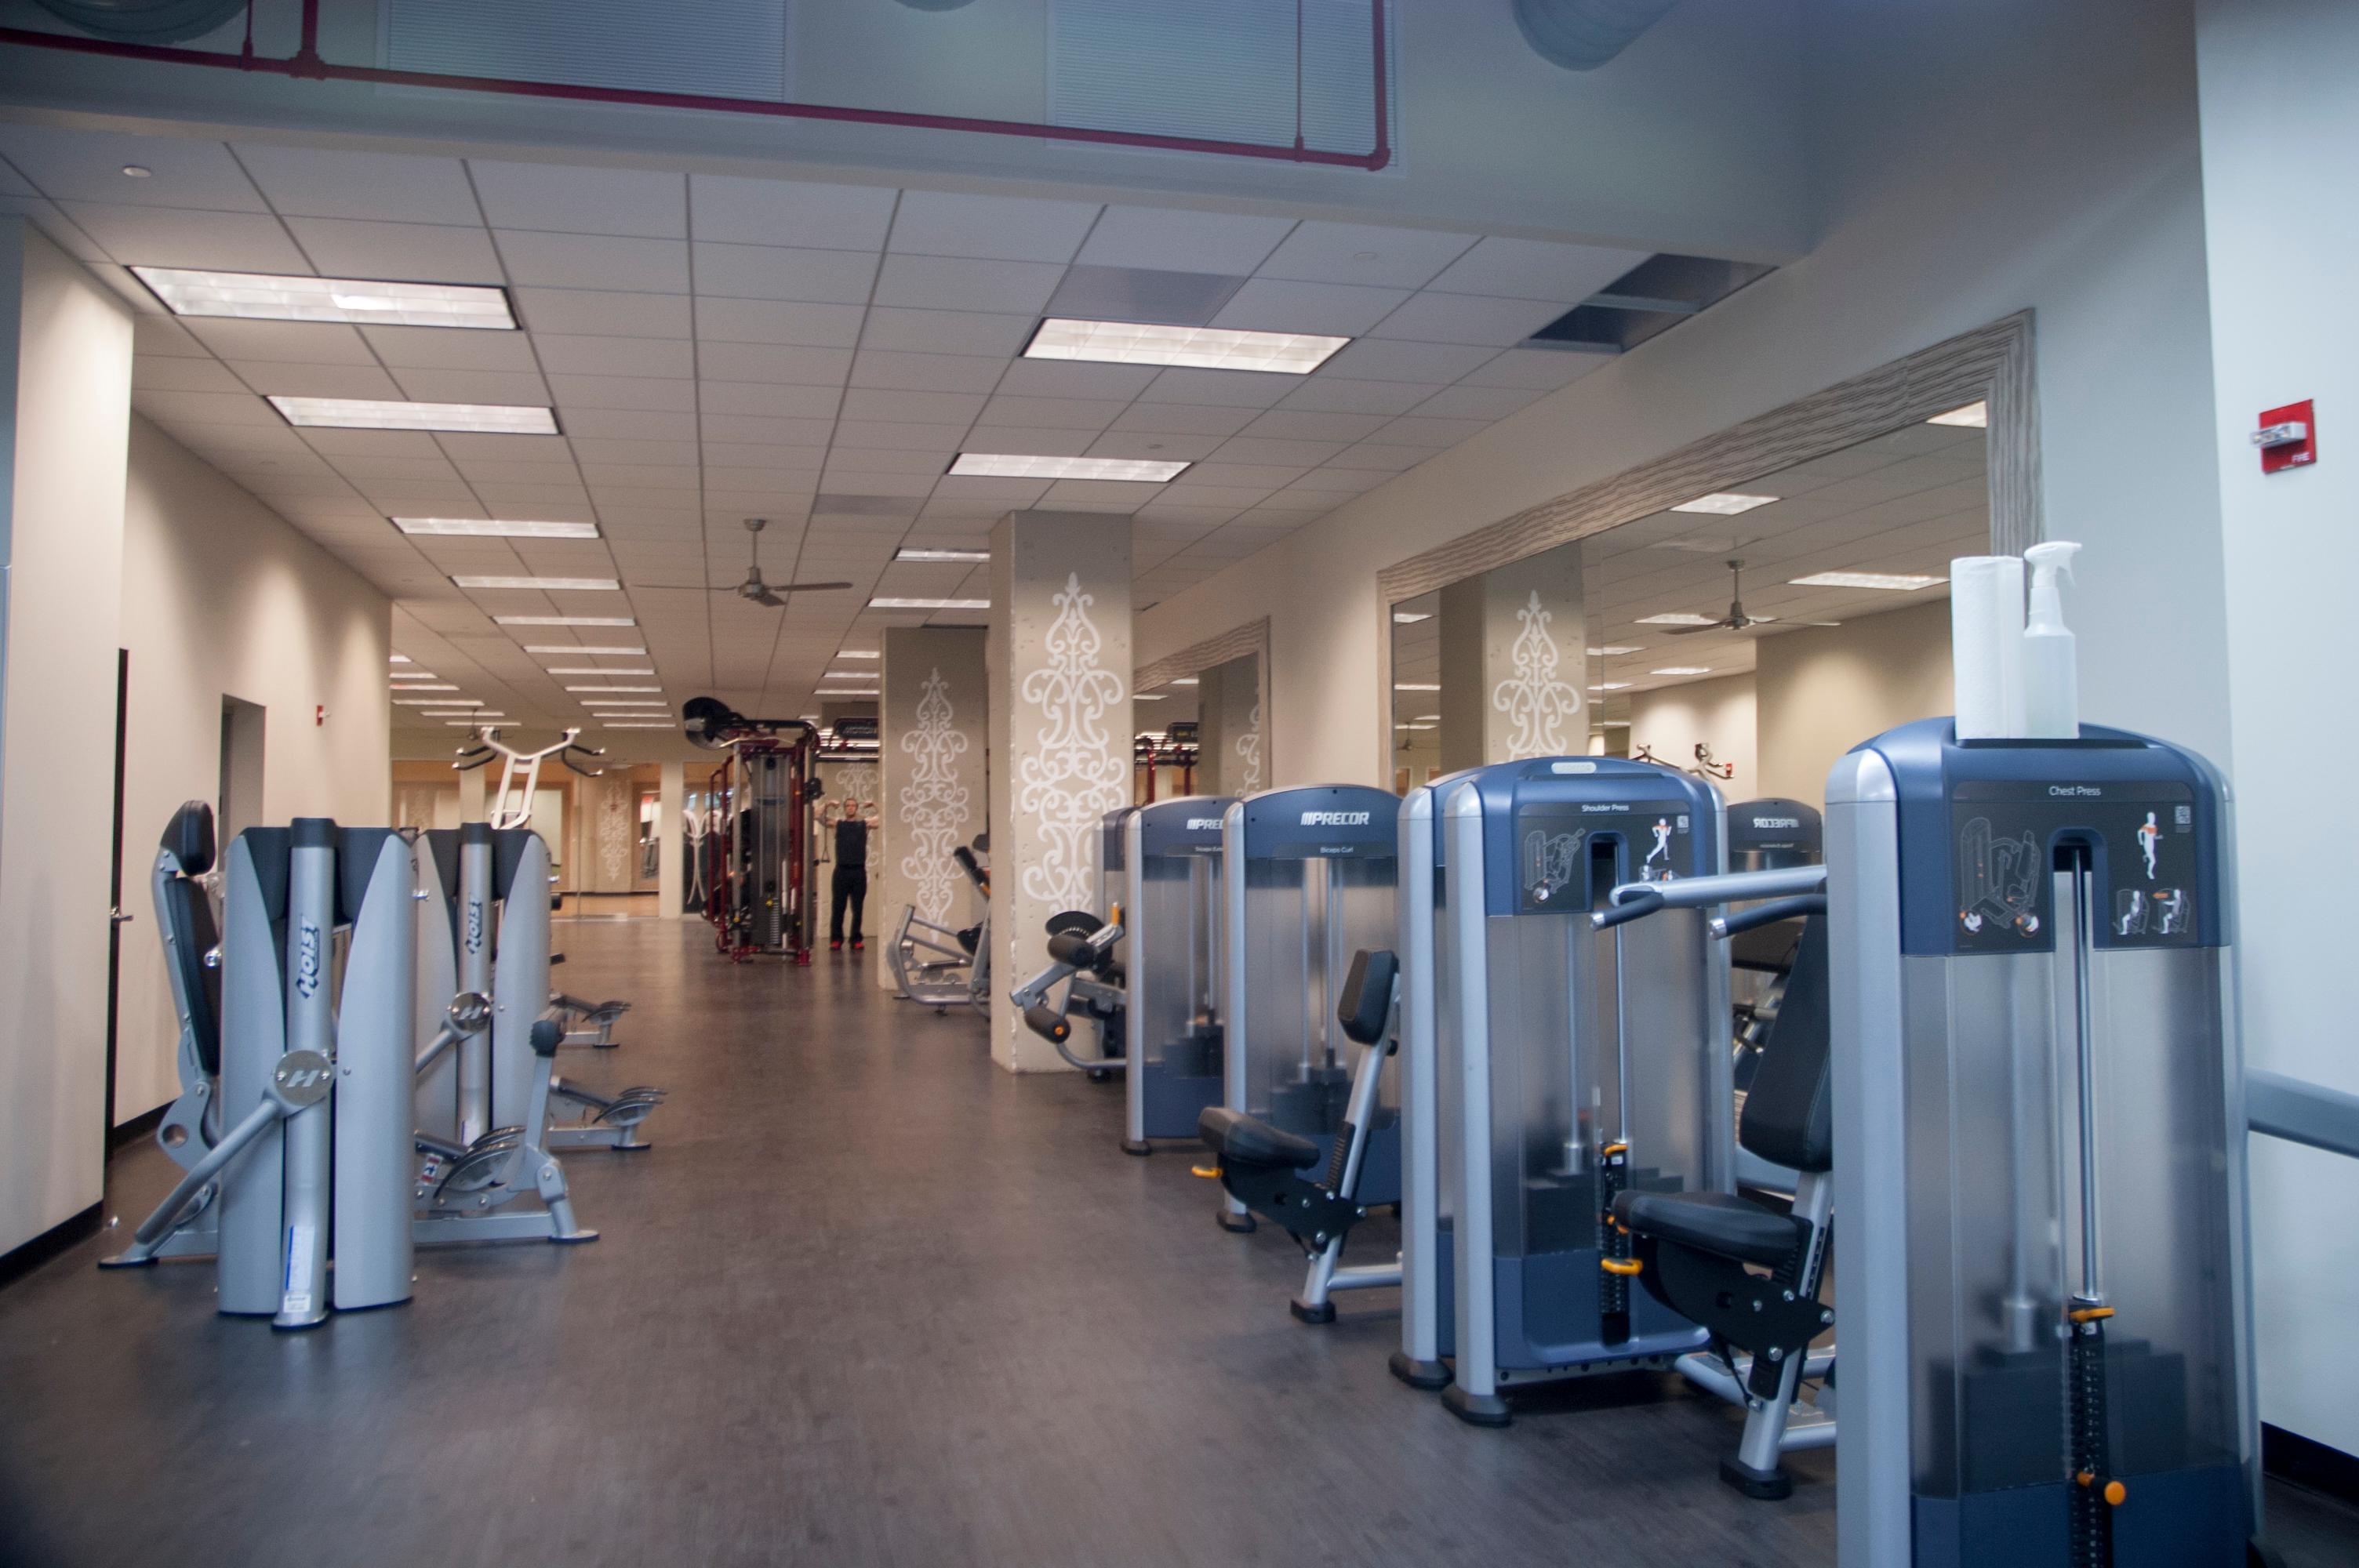 Crunch Fitness - Reston Town Center image 1